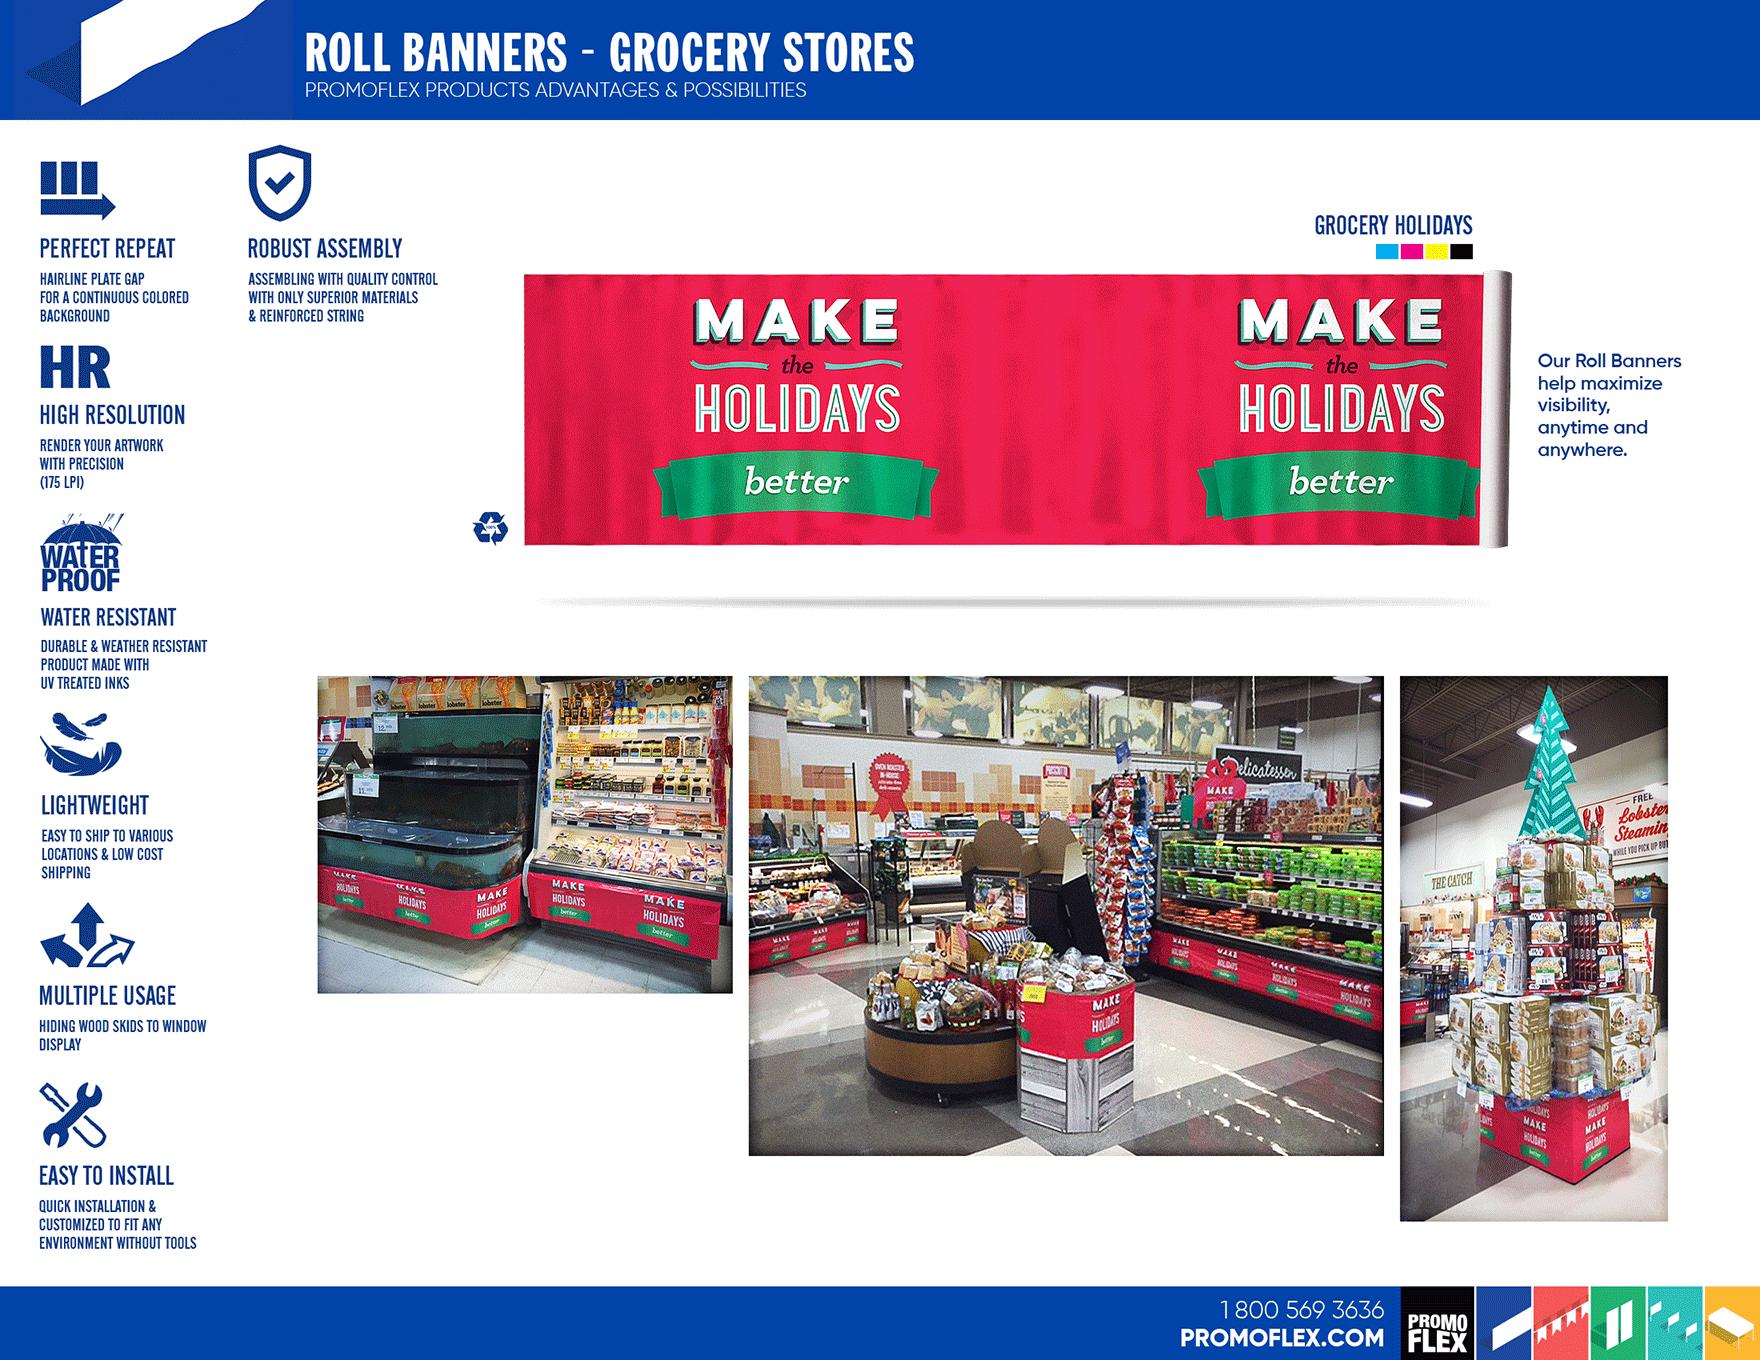 roll-banners-grocery-stores-en-10n.png (586 KB)